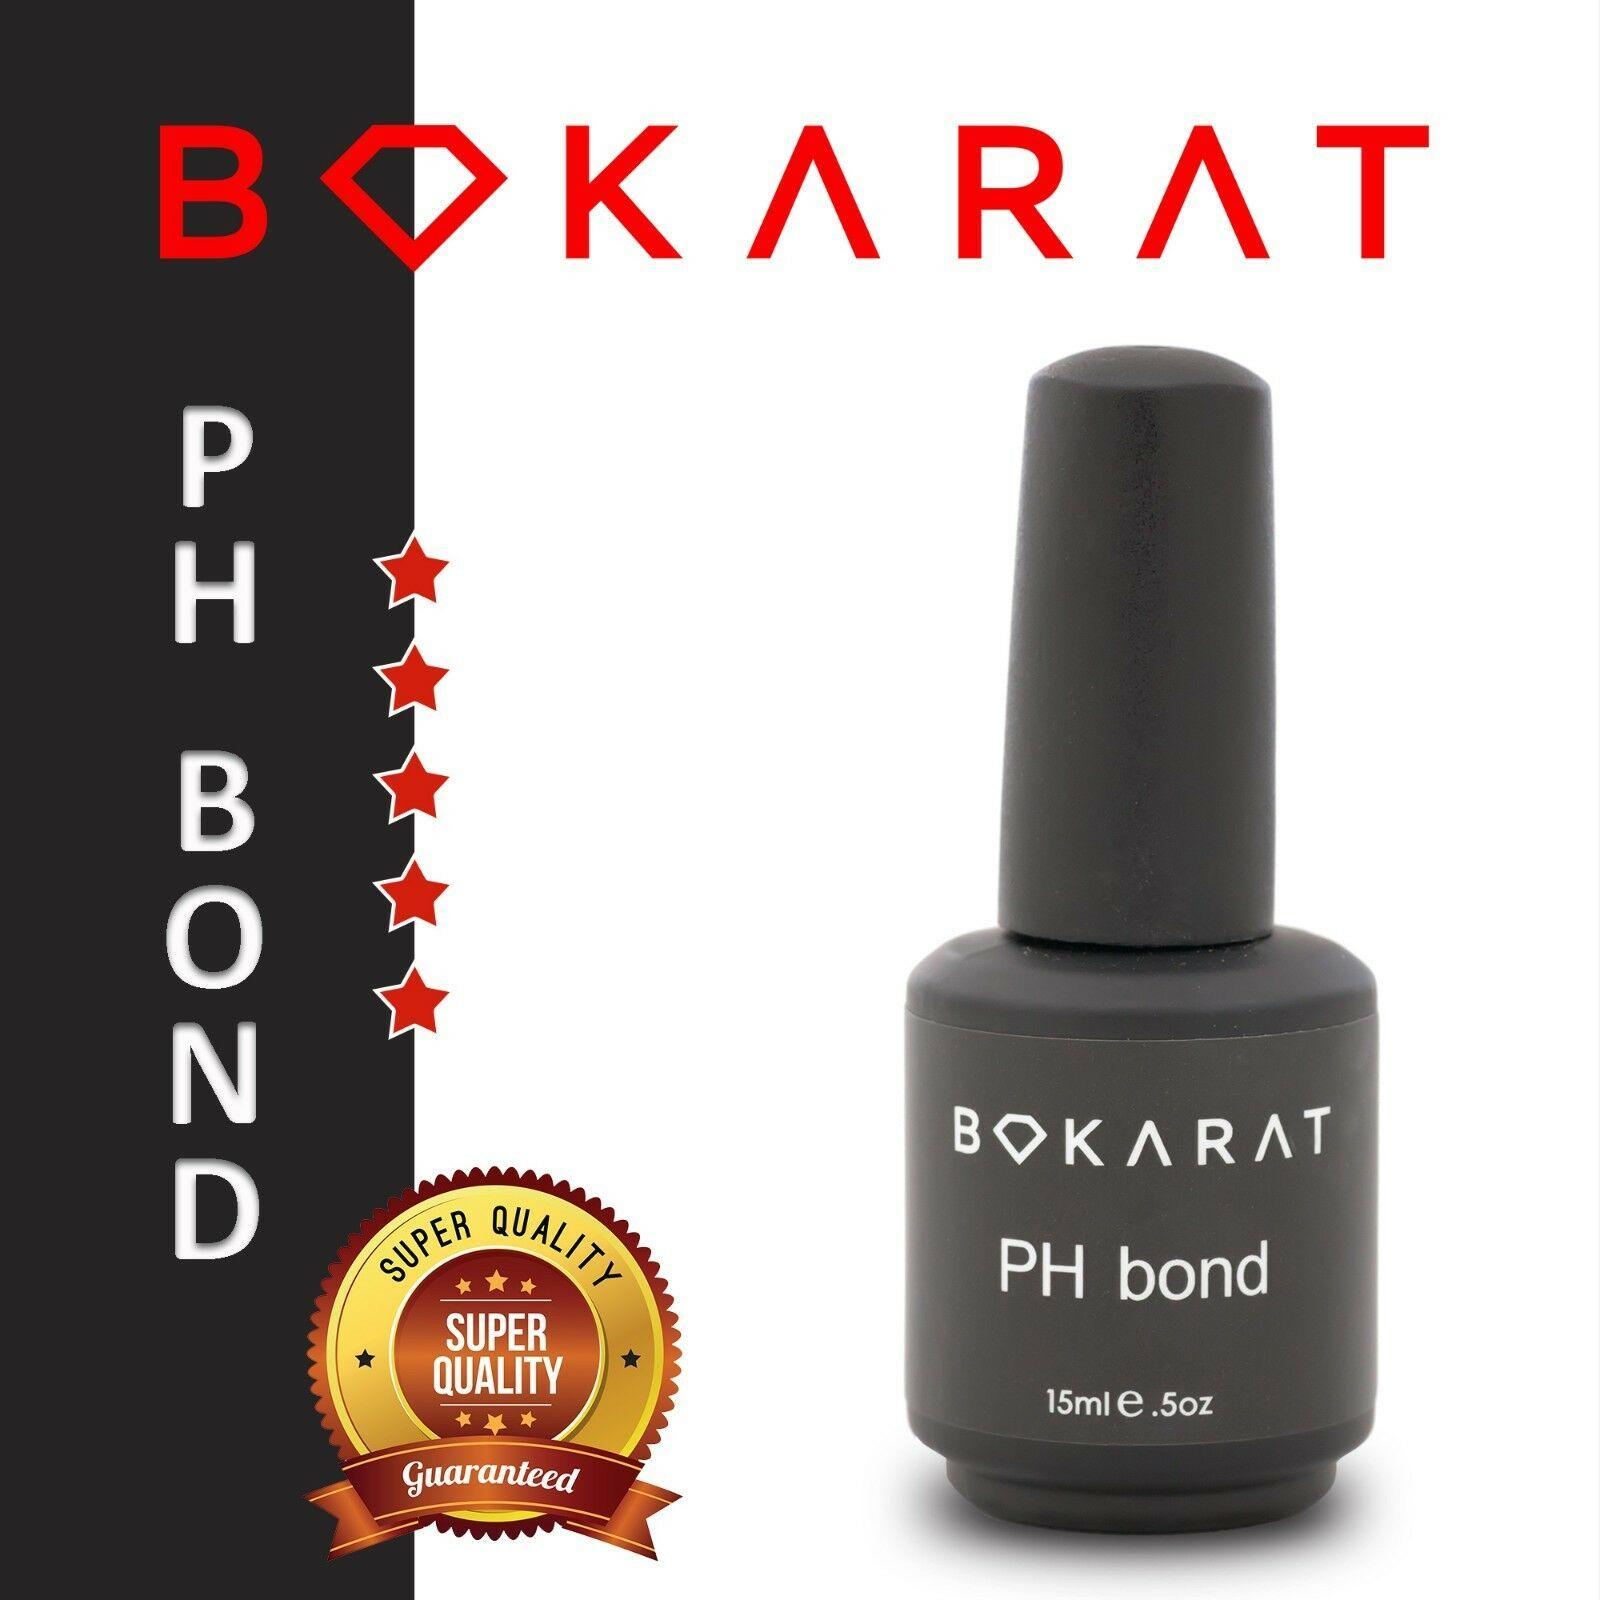 PH Bond Dehydrator Nail Prep for Soak-off Gel Nail Polish, 5Oz (15ml) Bokarat